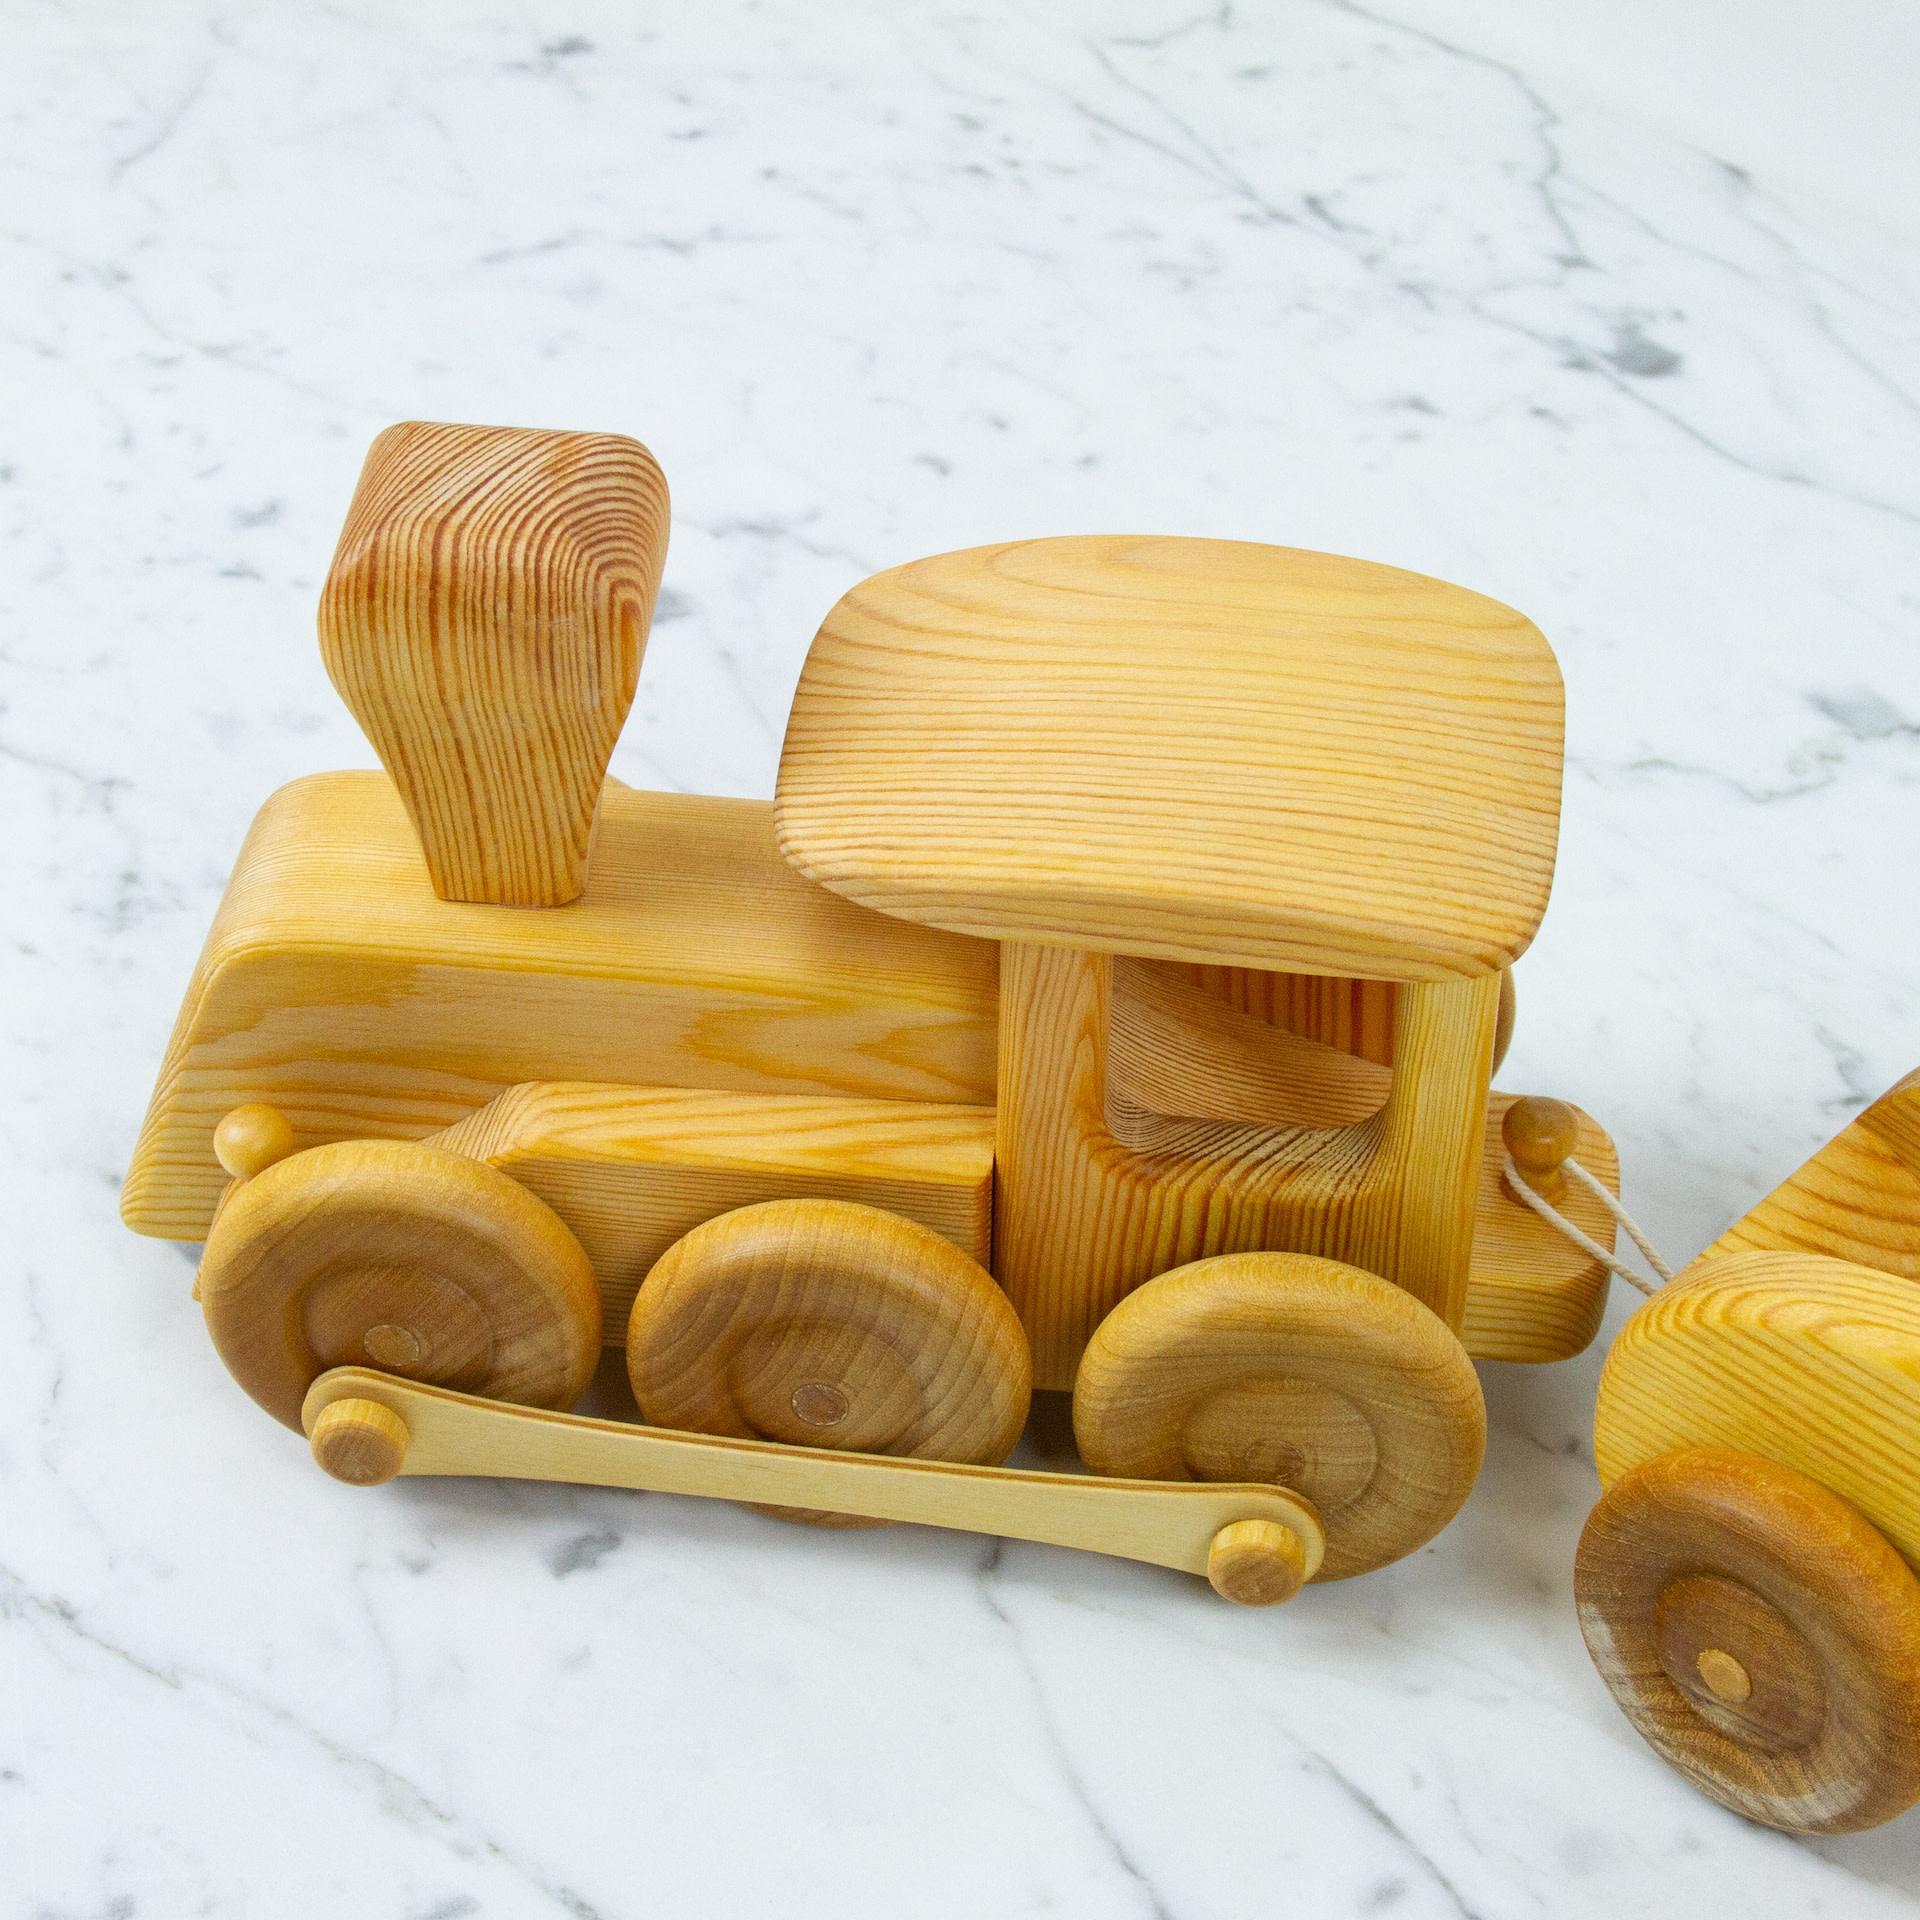 Swedish Wooden Toy Train Set